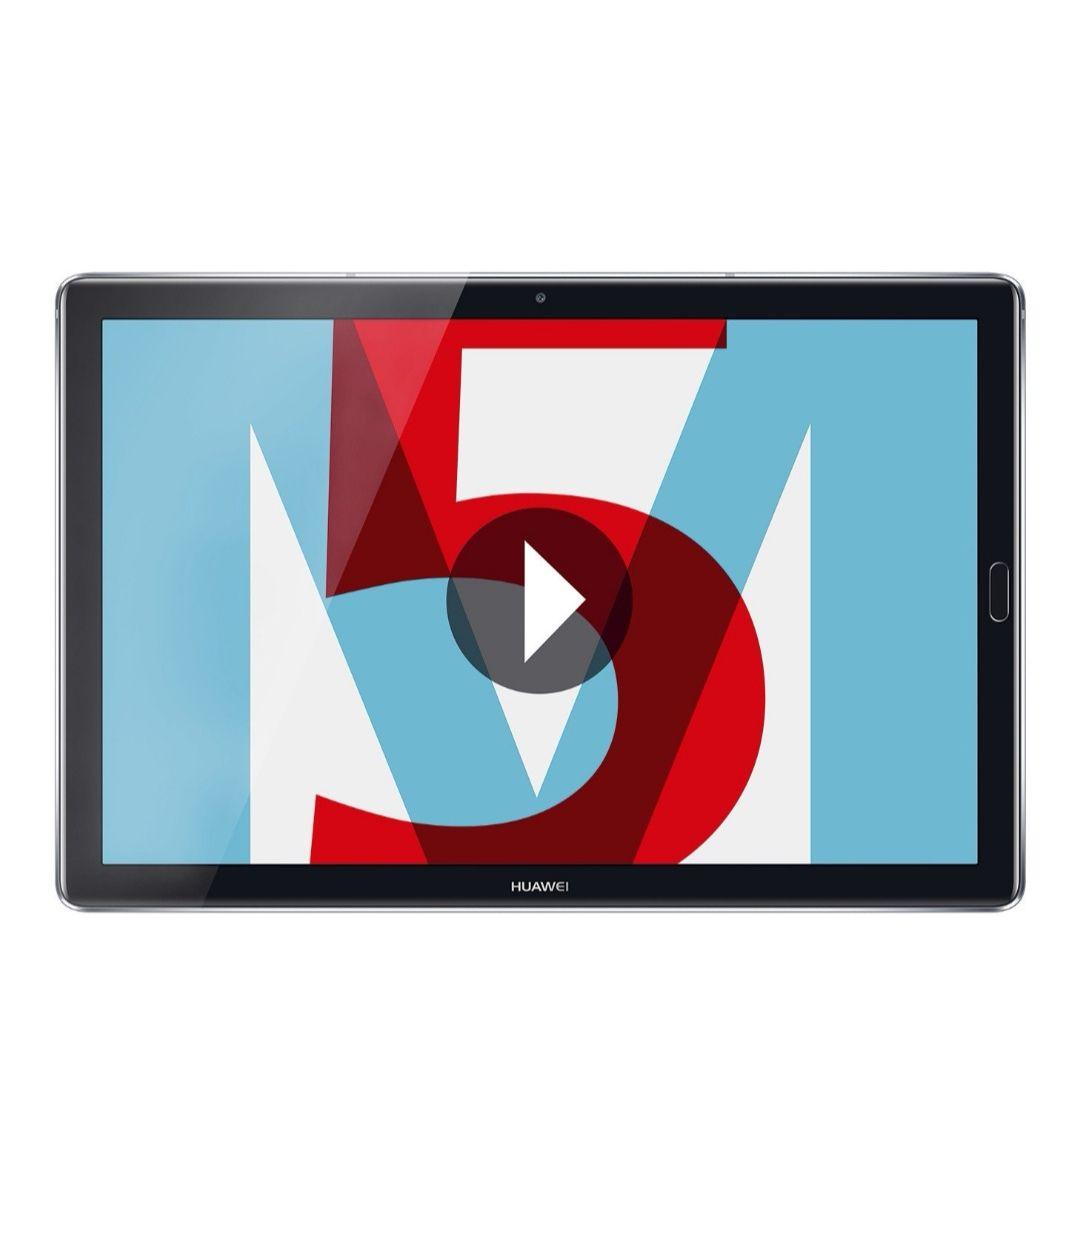 HUAWEI MediaPad M5 32 GB 10.8 Zoll Tablet Wifi Space Grey für 279€ [Lokal Media Markt Köln